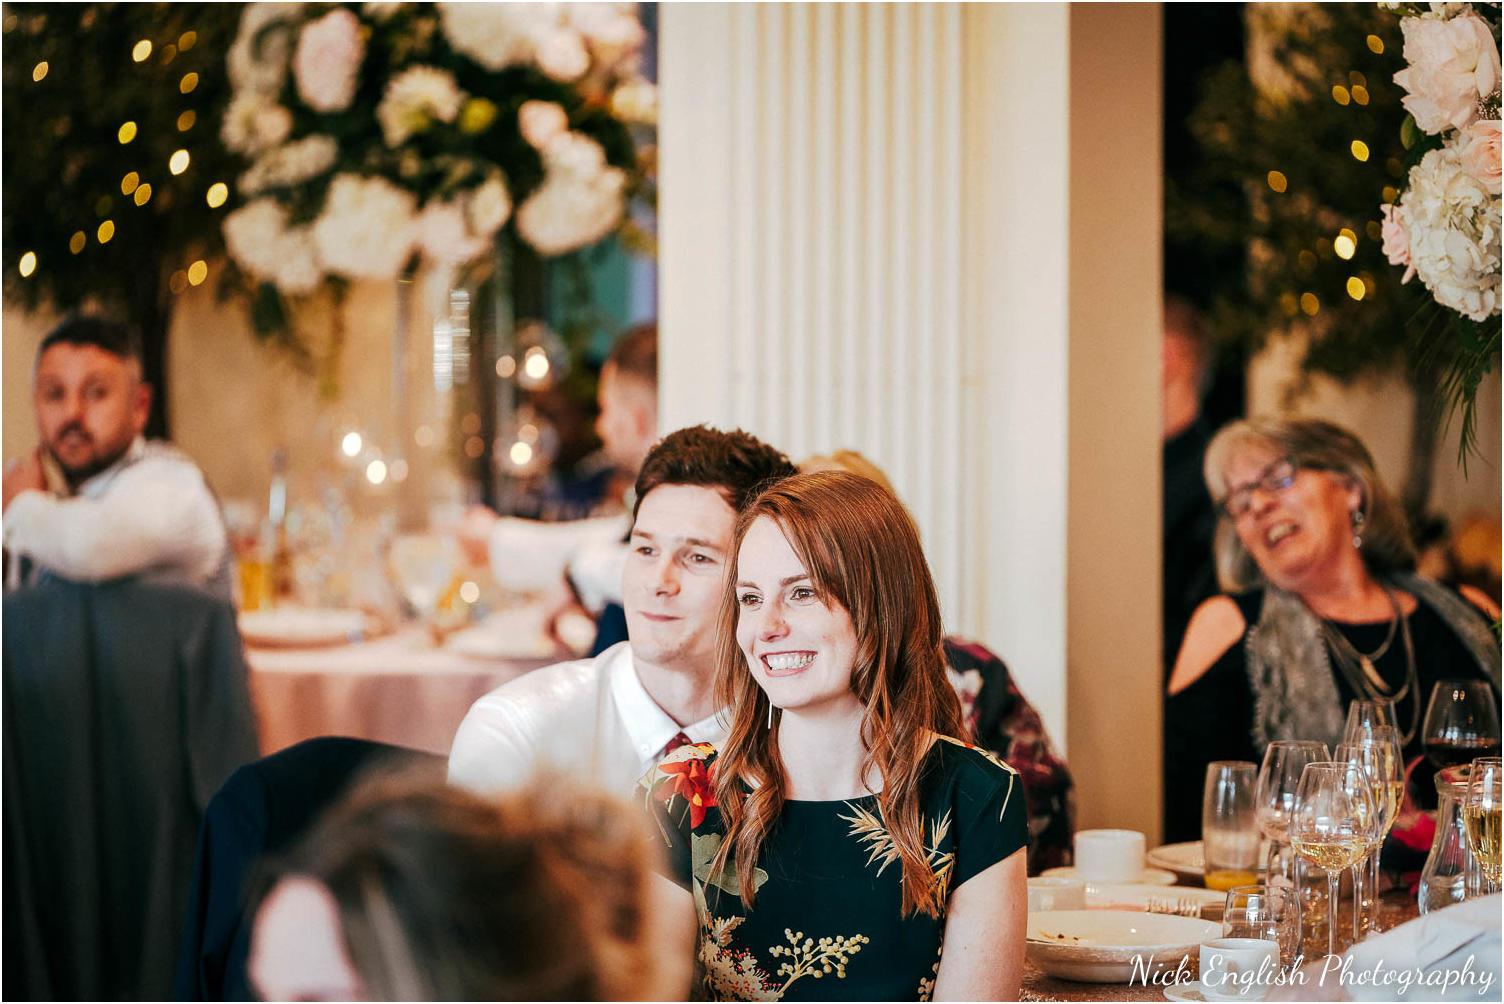 Mitton_Hall_Wedding_Photographer-158.jpg